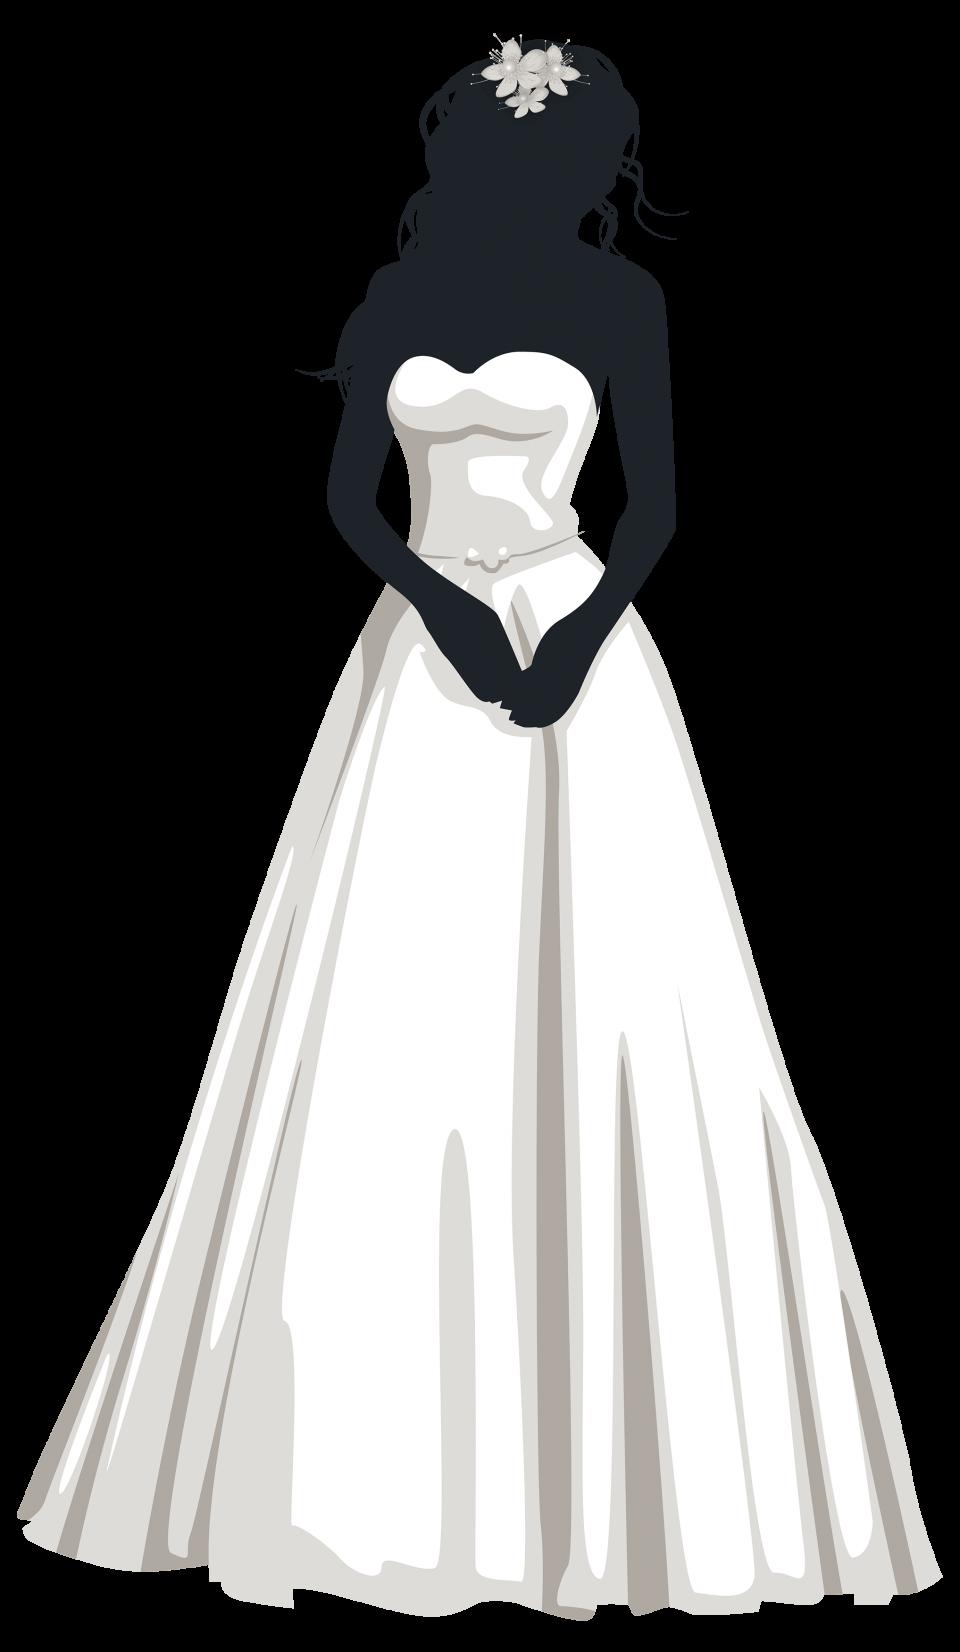 Bride PNG Image